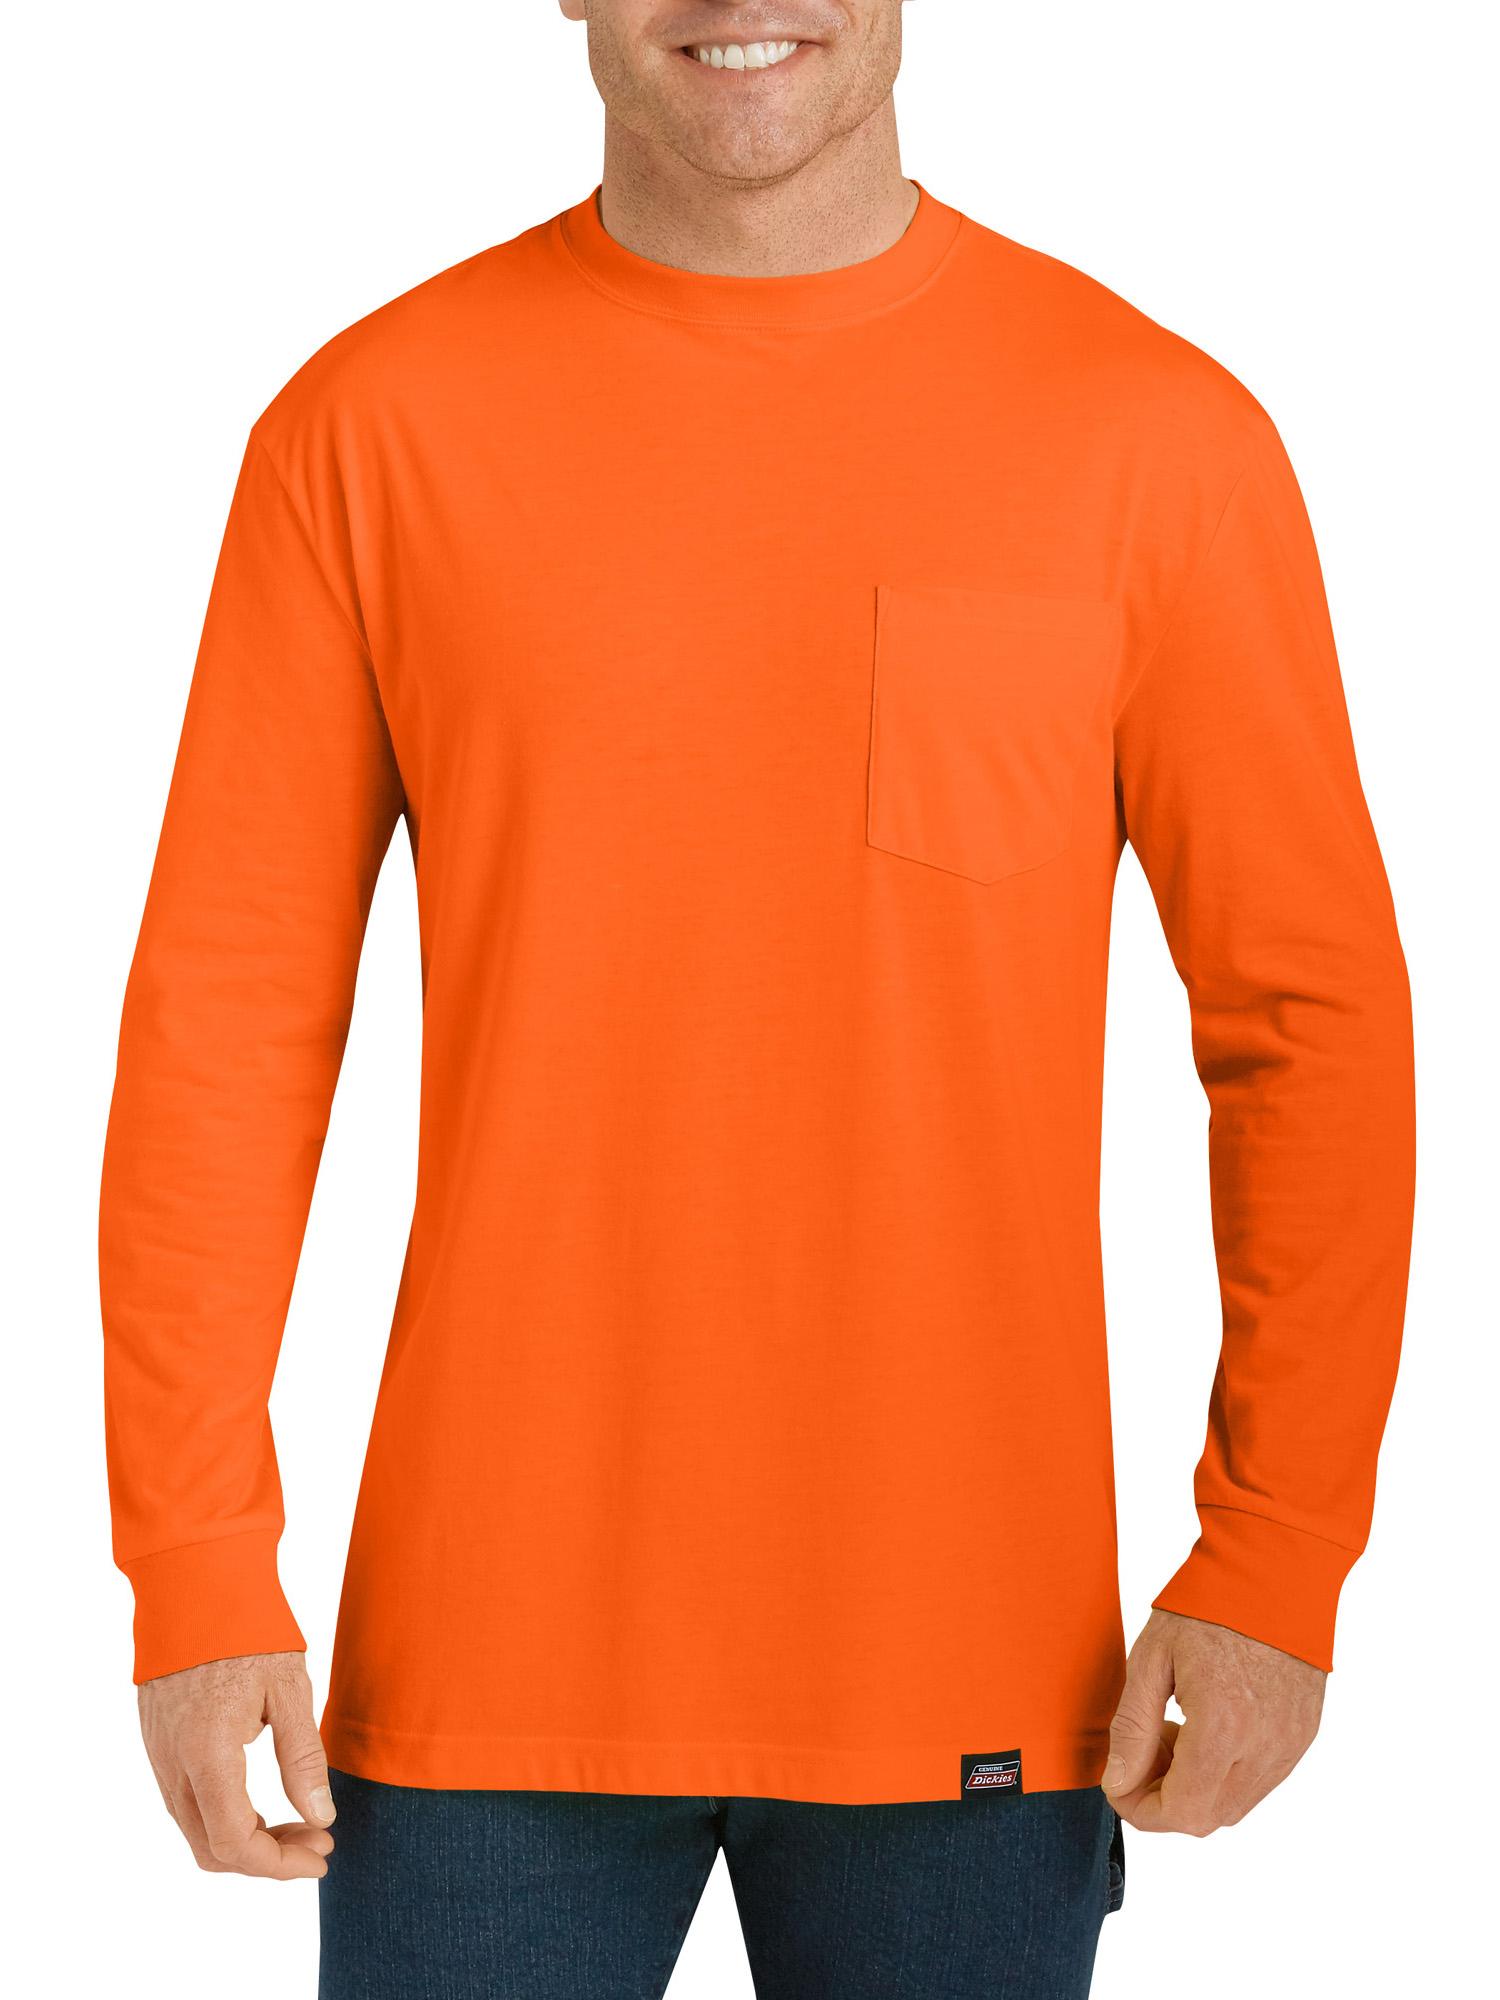 Short Sleeve WRANGLER Mens 3W700SO Cotton SAFETY ORANGE T XL TALL